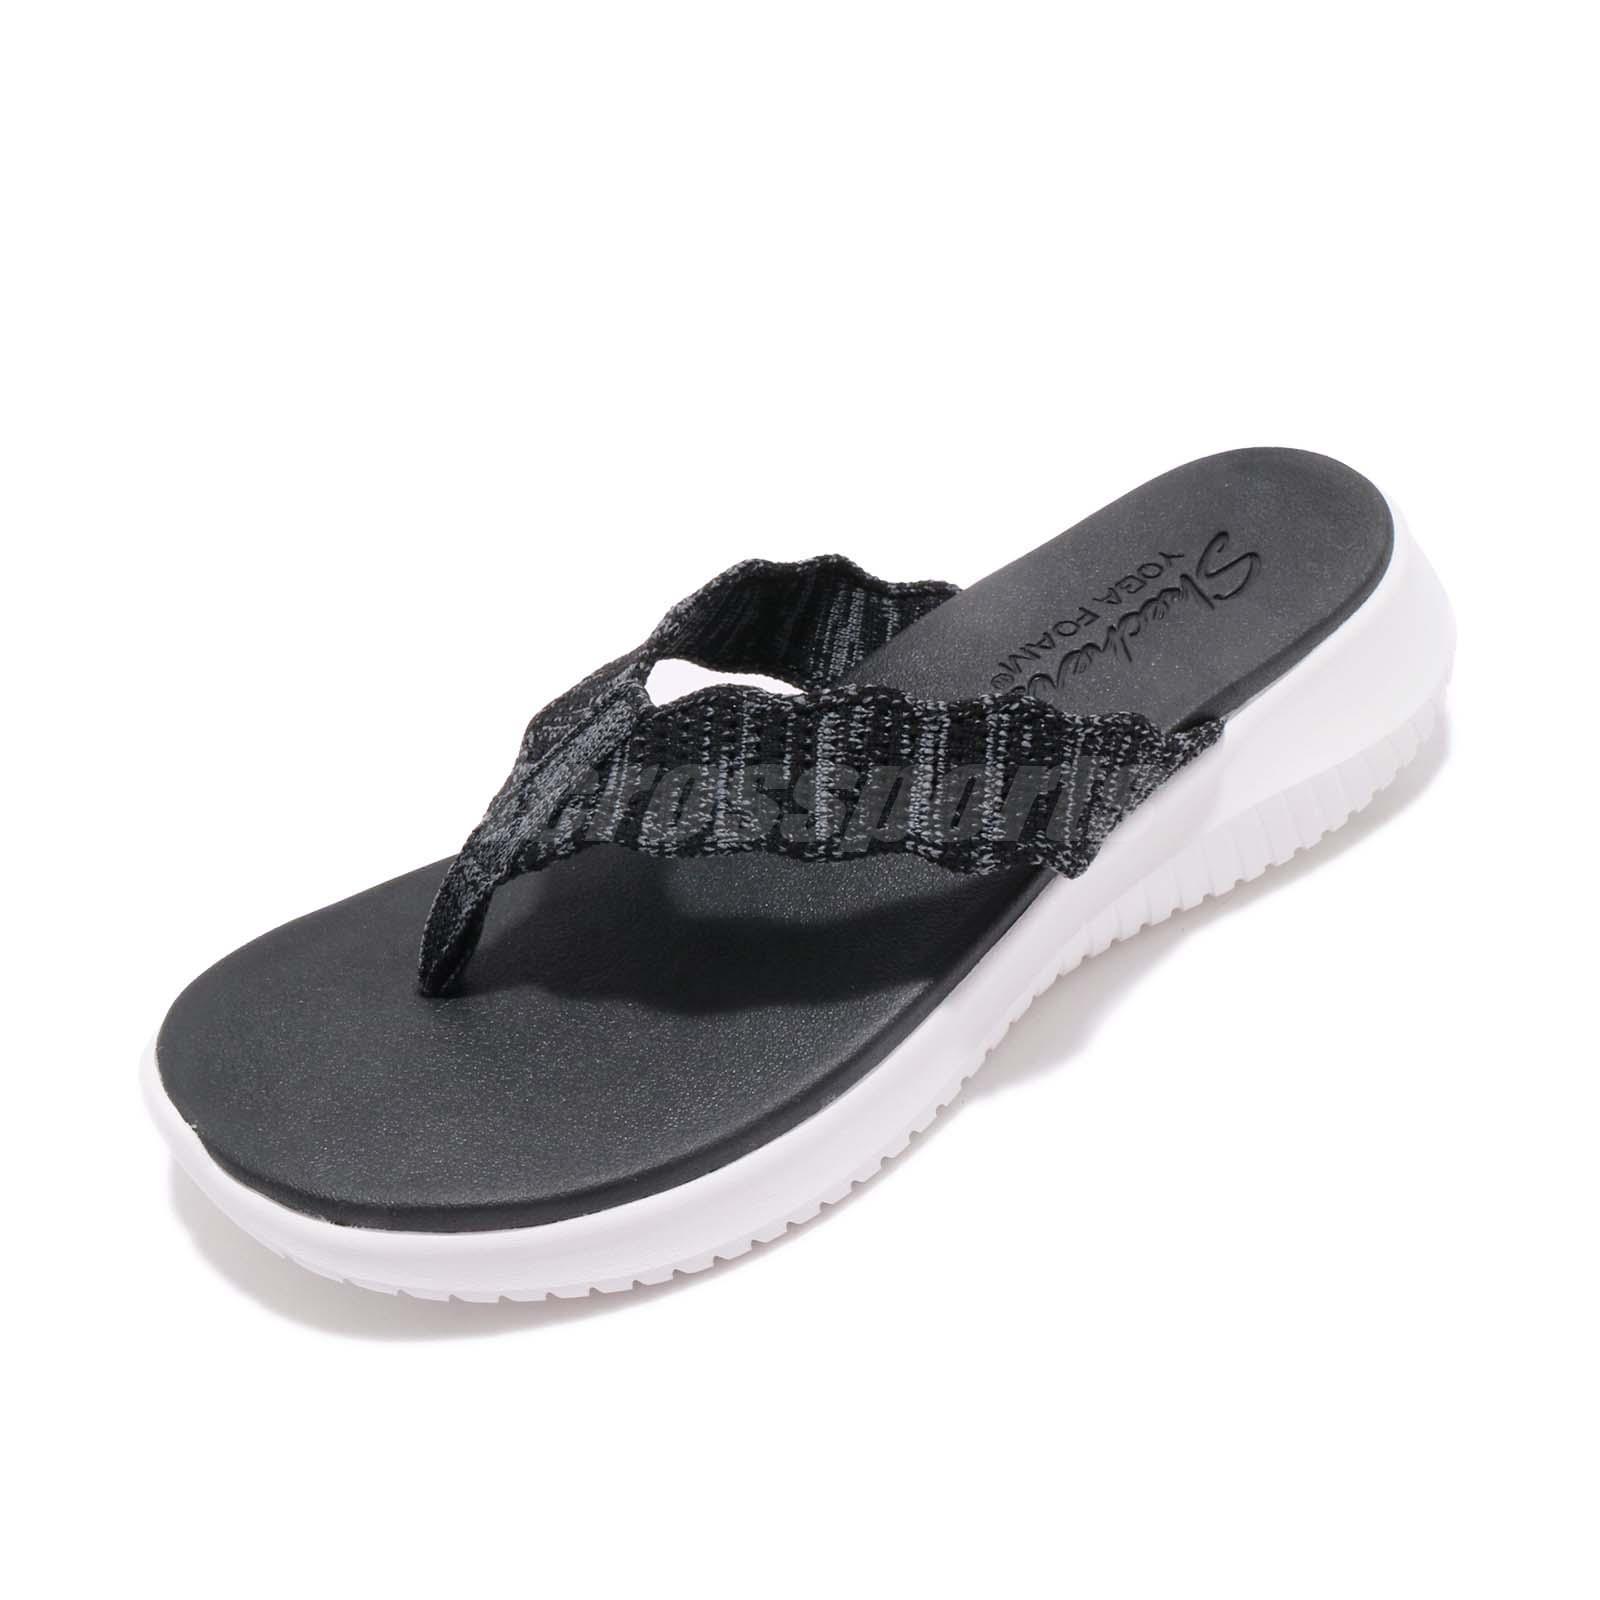 Skechers Womens Black Flip Flops